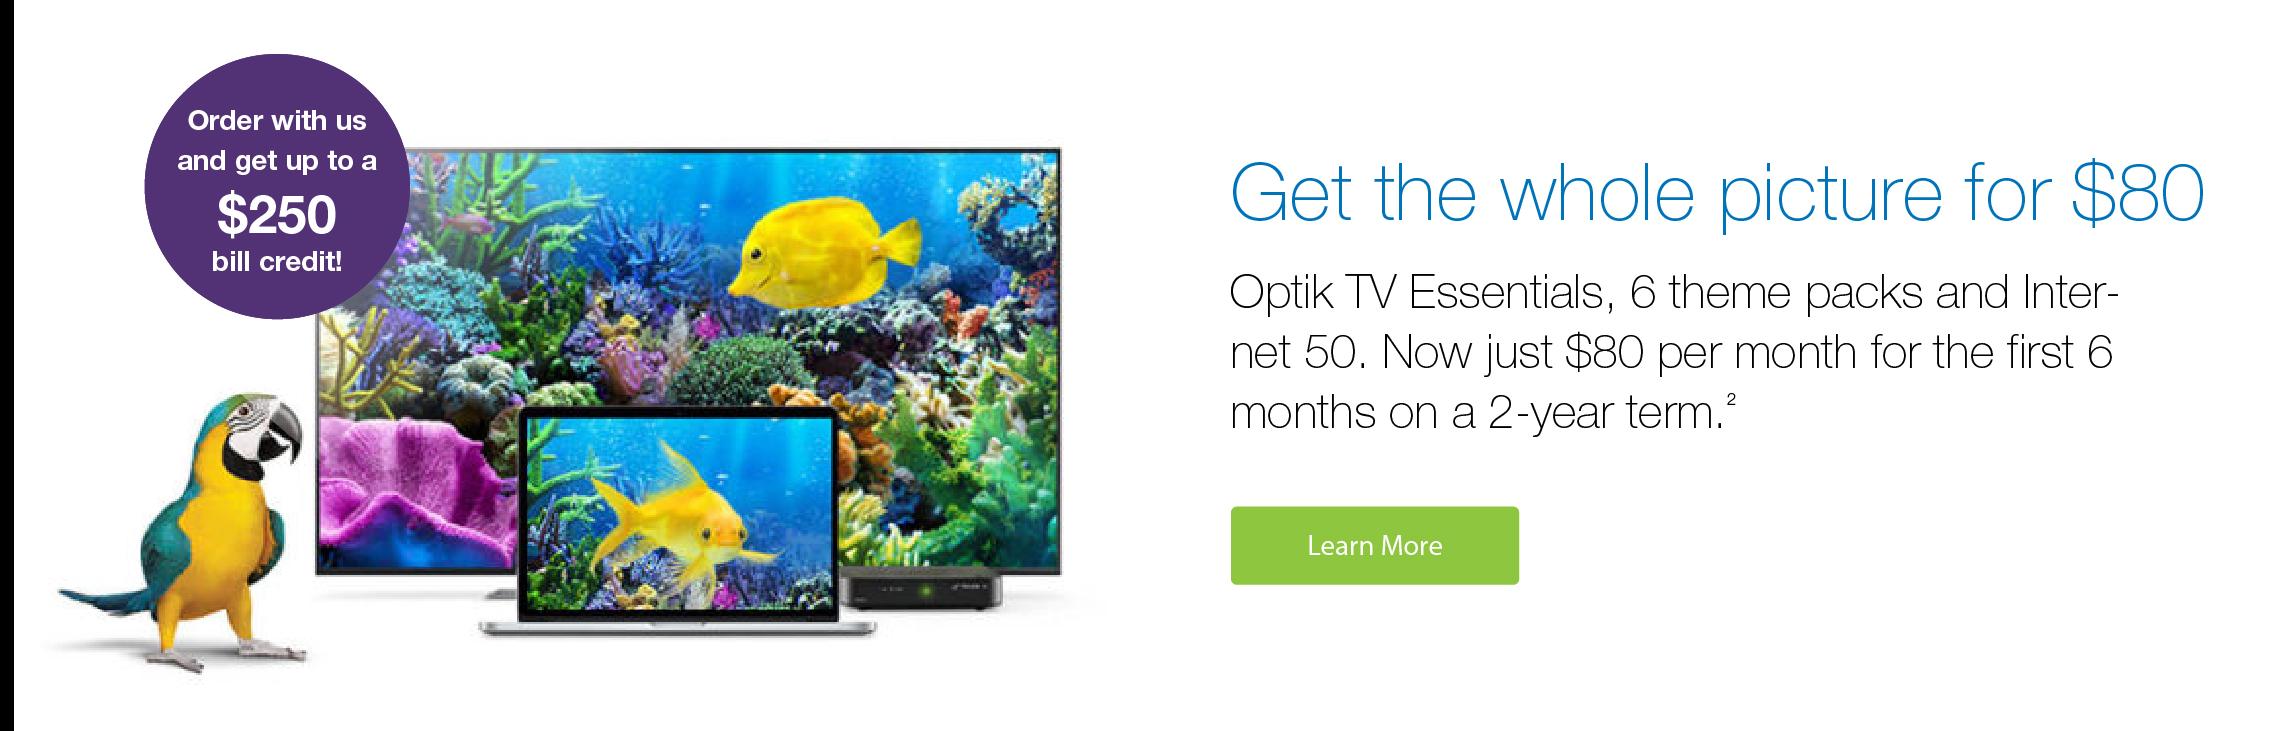 Optik TV & Internet Bundle